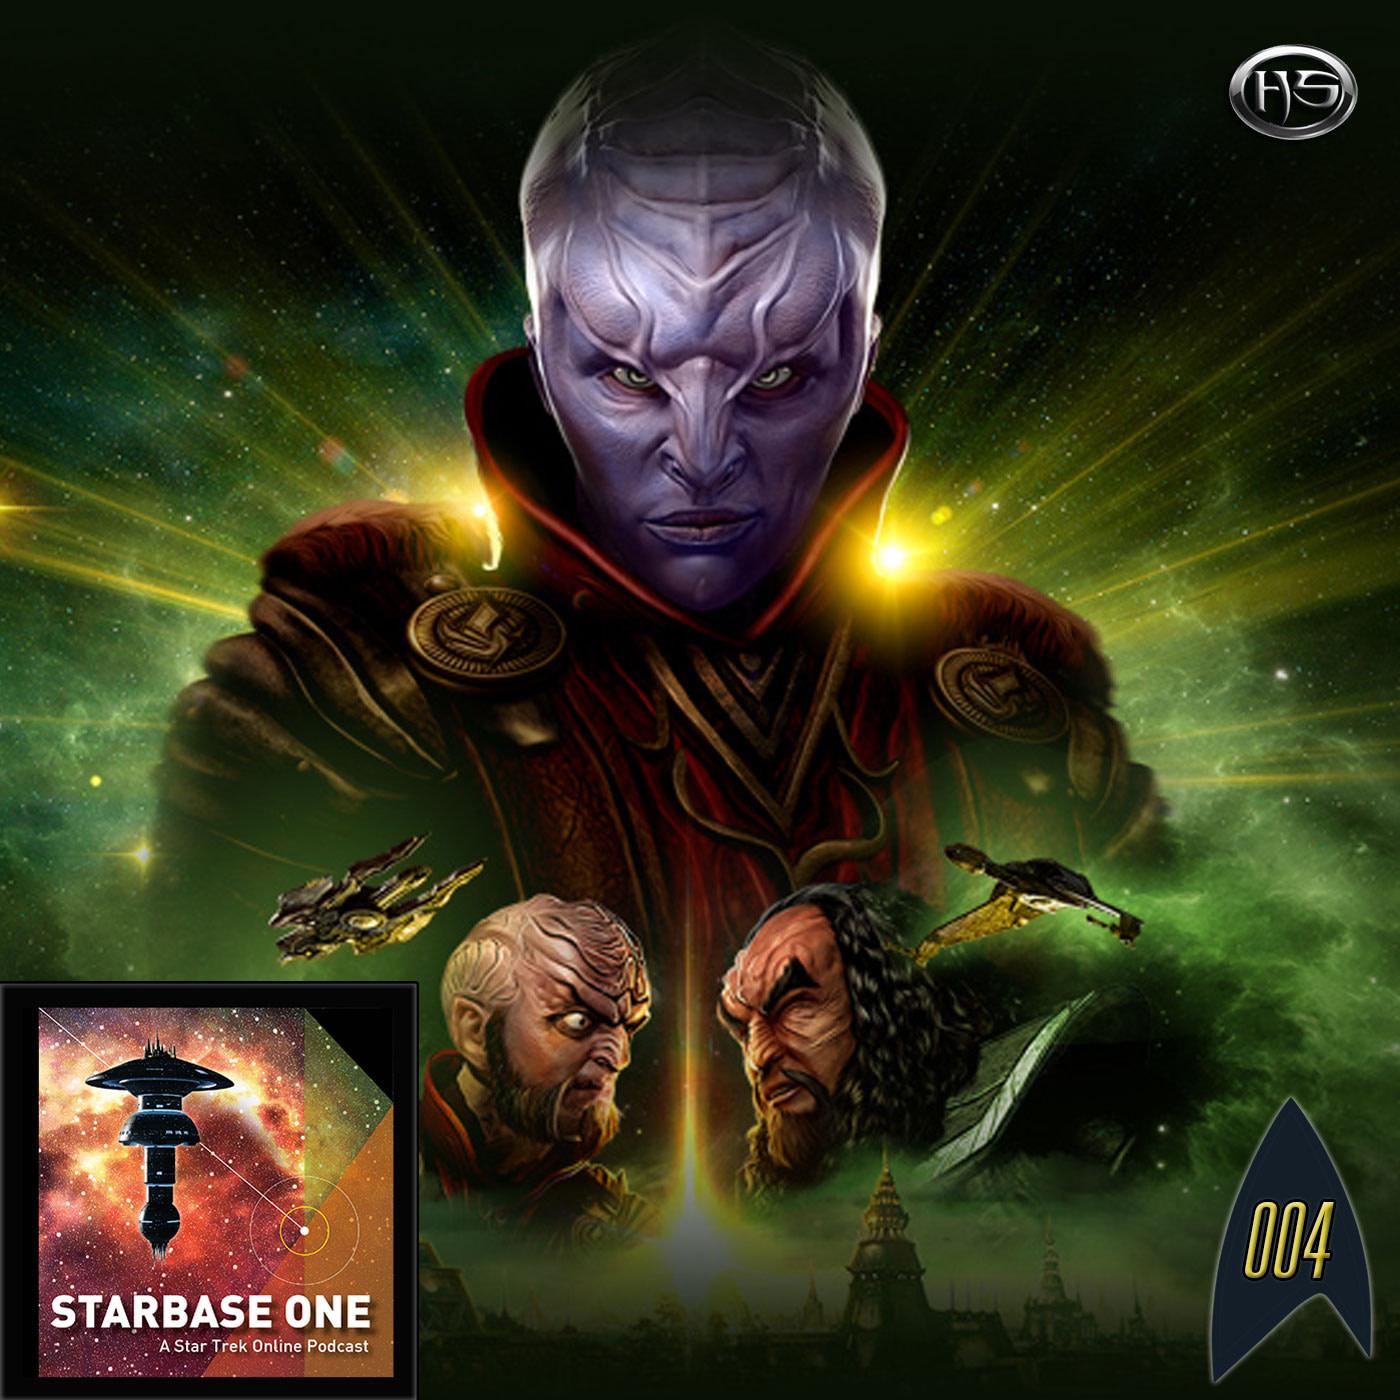 Starbase One Episode 4